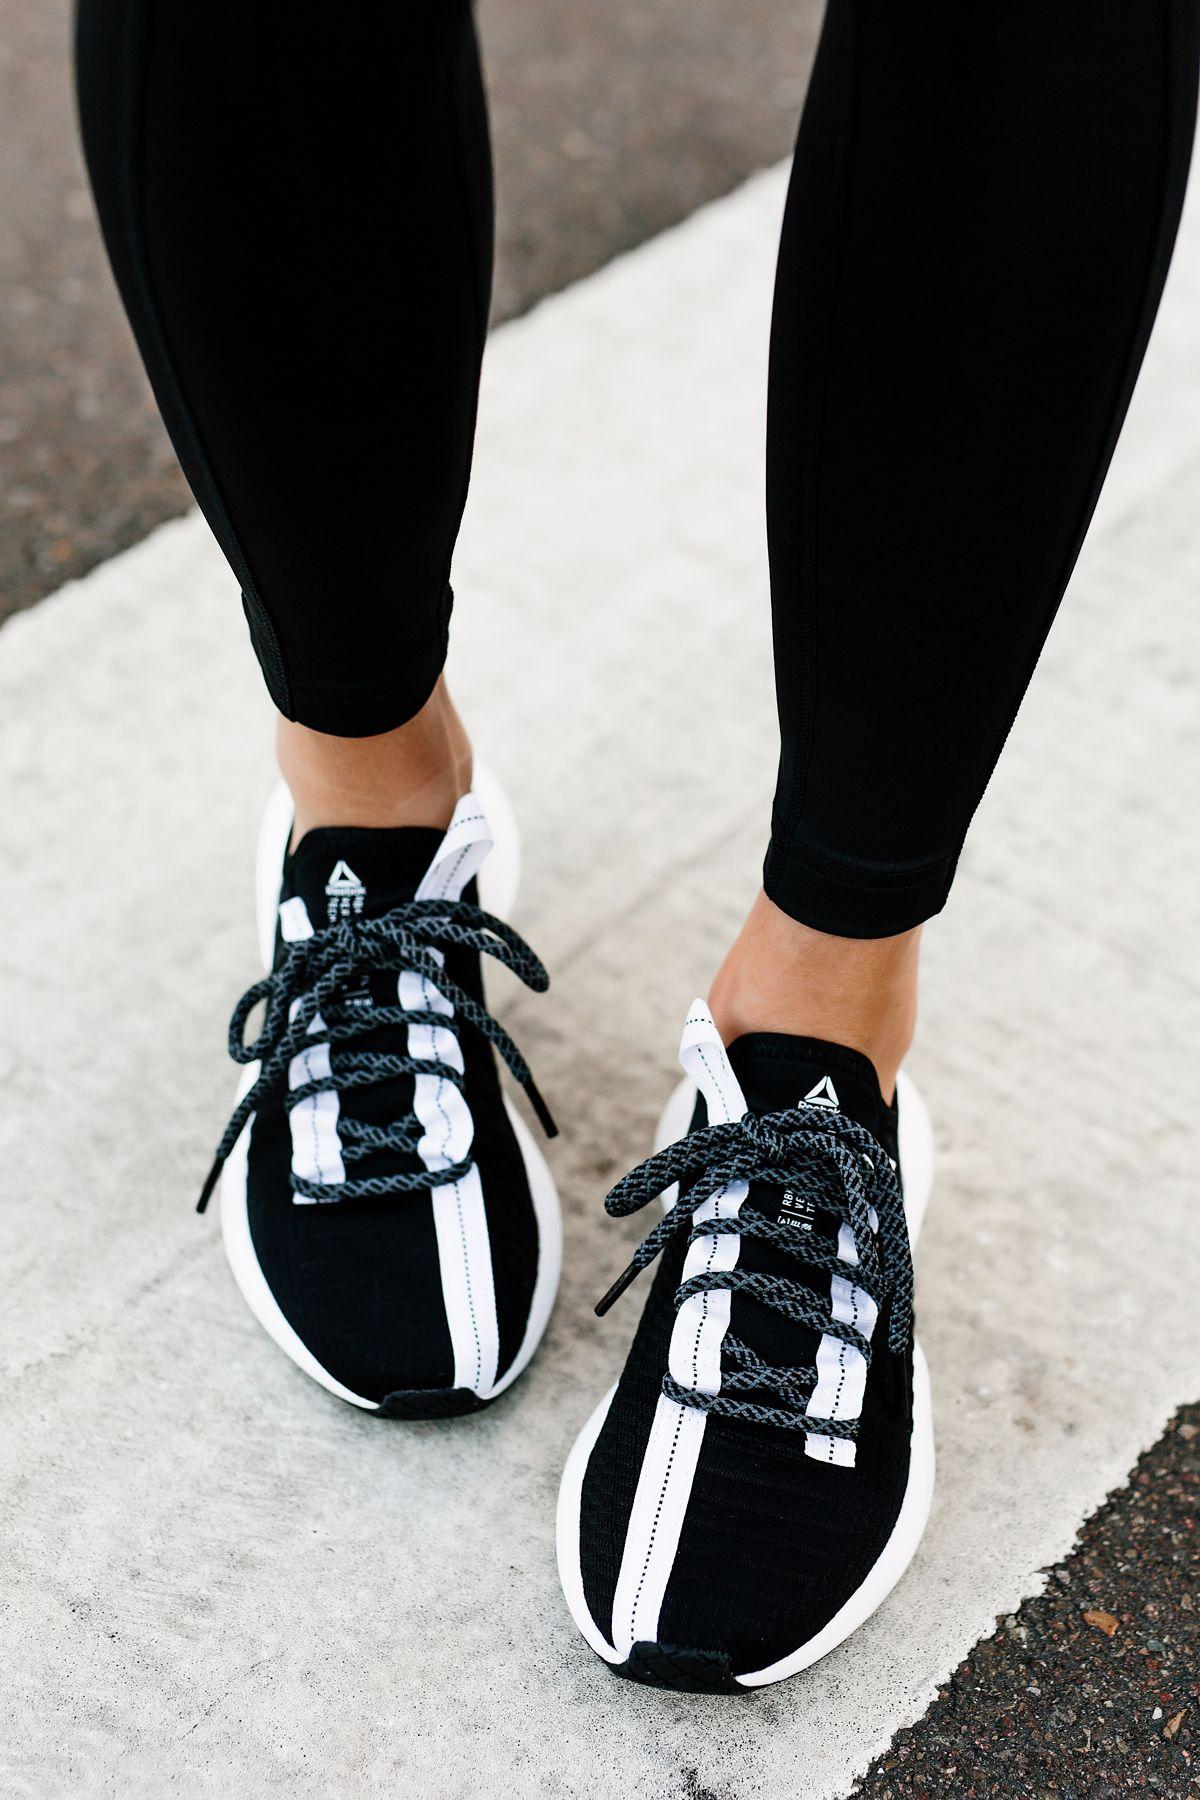 0603854a74181c Woman Wearing Black Leggings Reebok Sole Fury Black Sneakers Fashion  Jackson San Diego Fashion Blogger